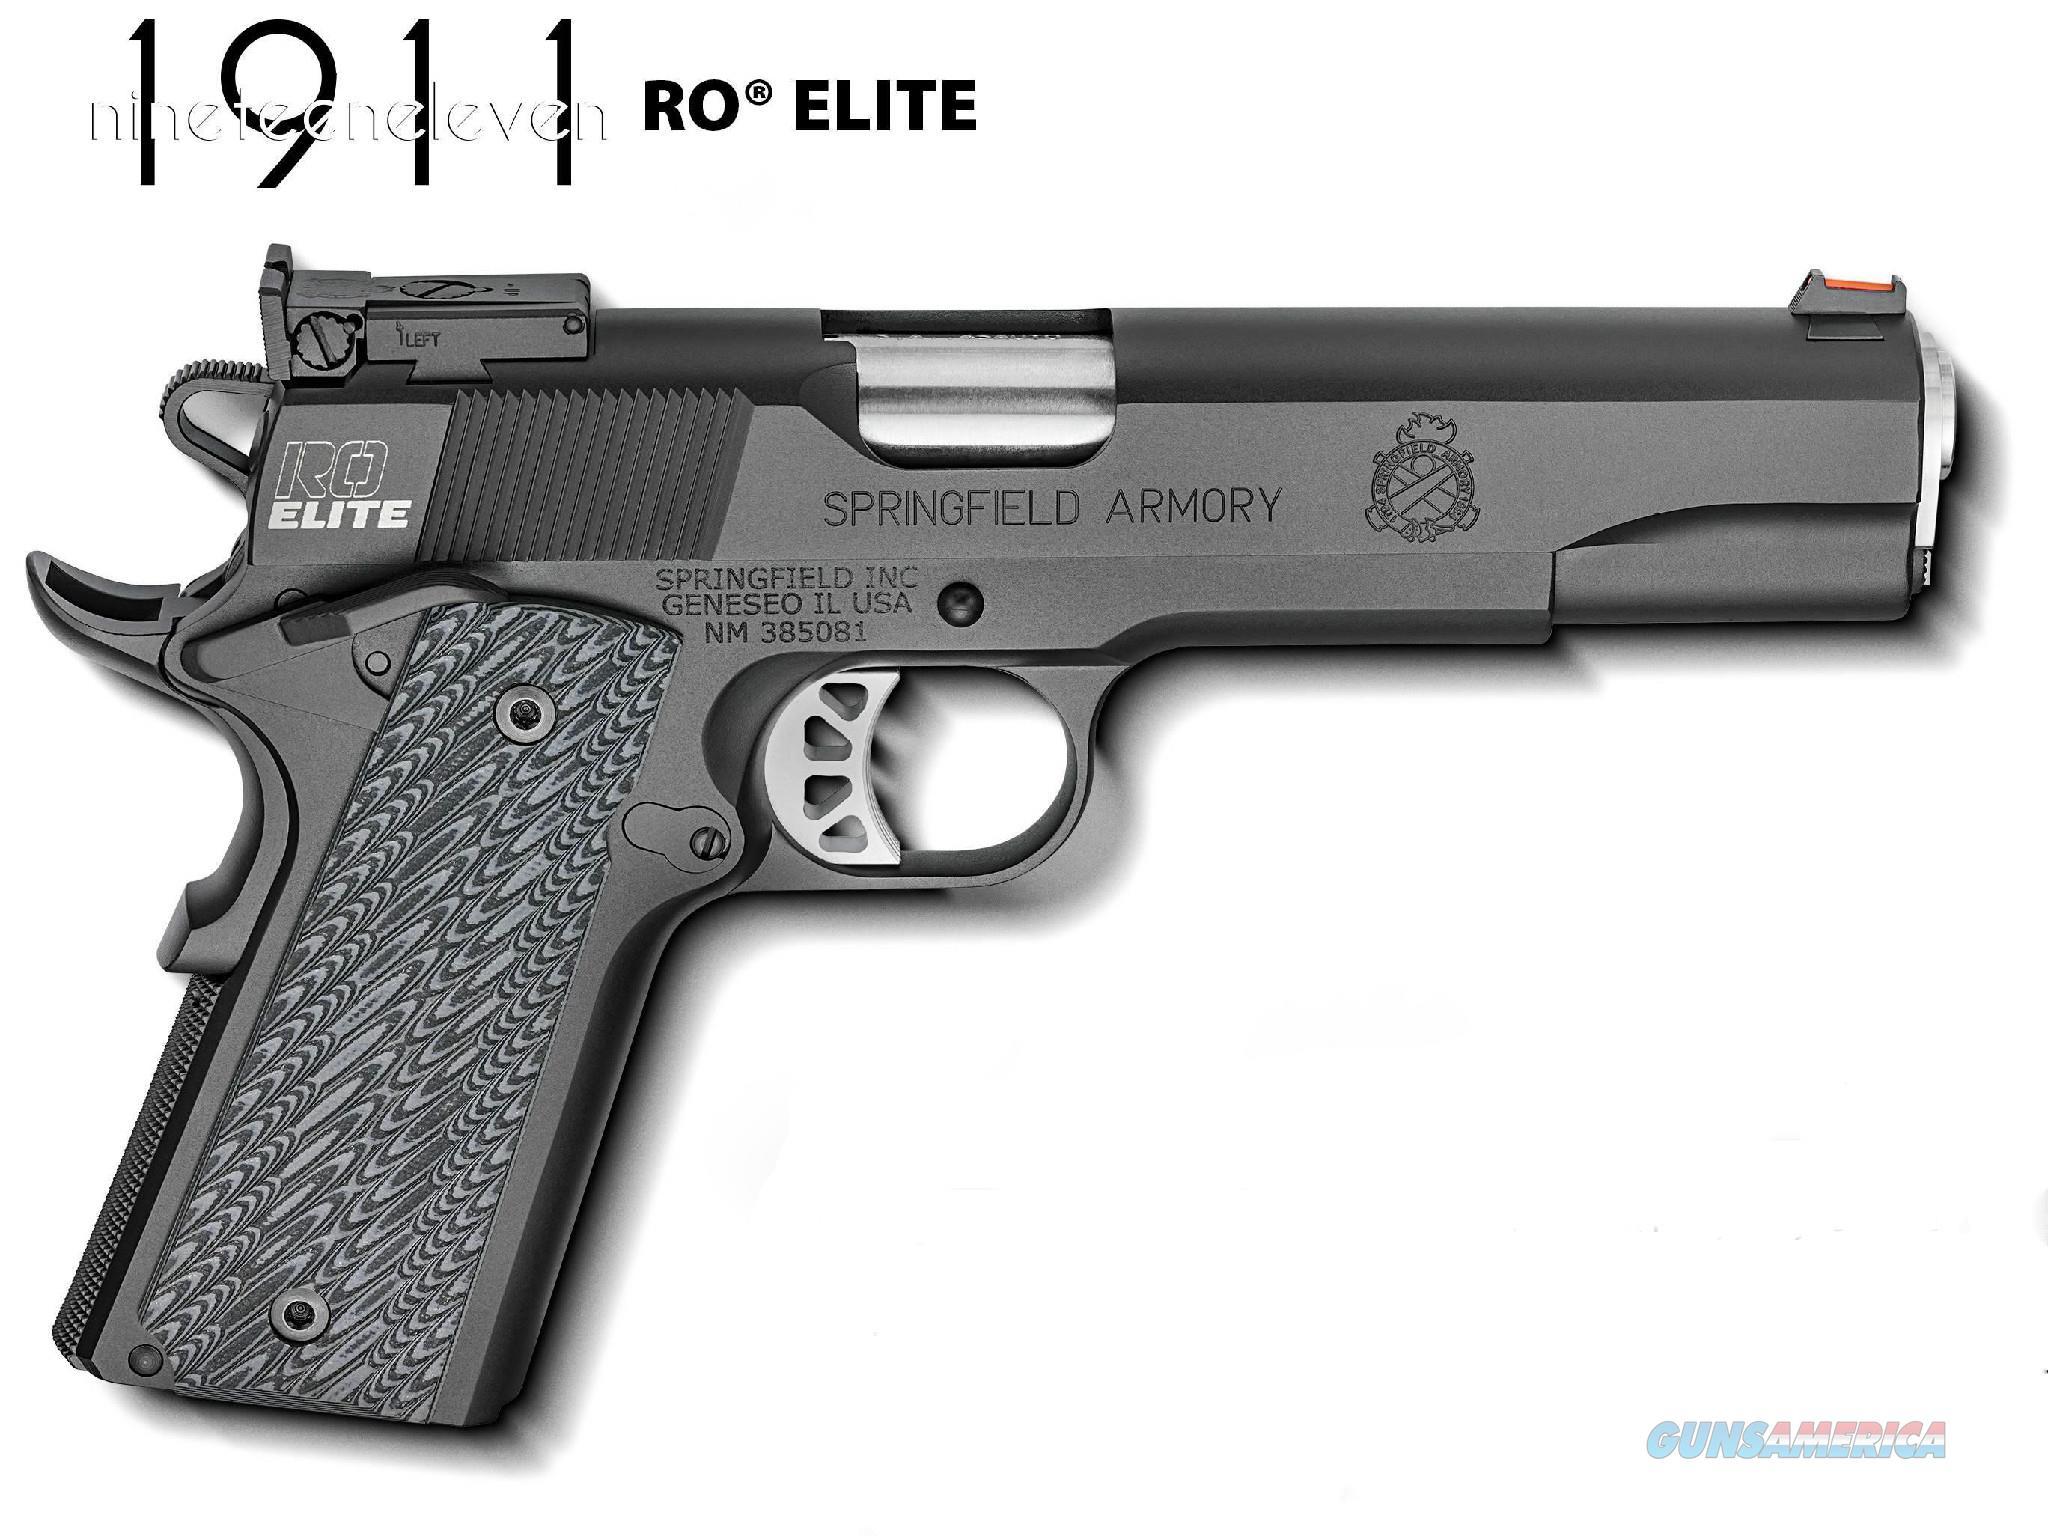 Springfield 1911 RO Elite Target .45 acp FO G10 PI9128ER *NEW* 4 Mags Gear Pkg  Guns > Pistols > Springfield Armory Pistols > 1911 Type